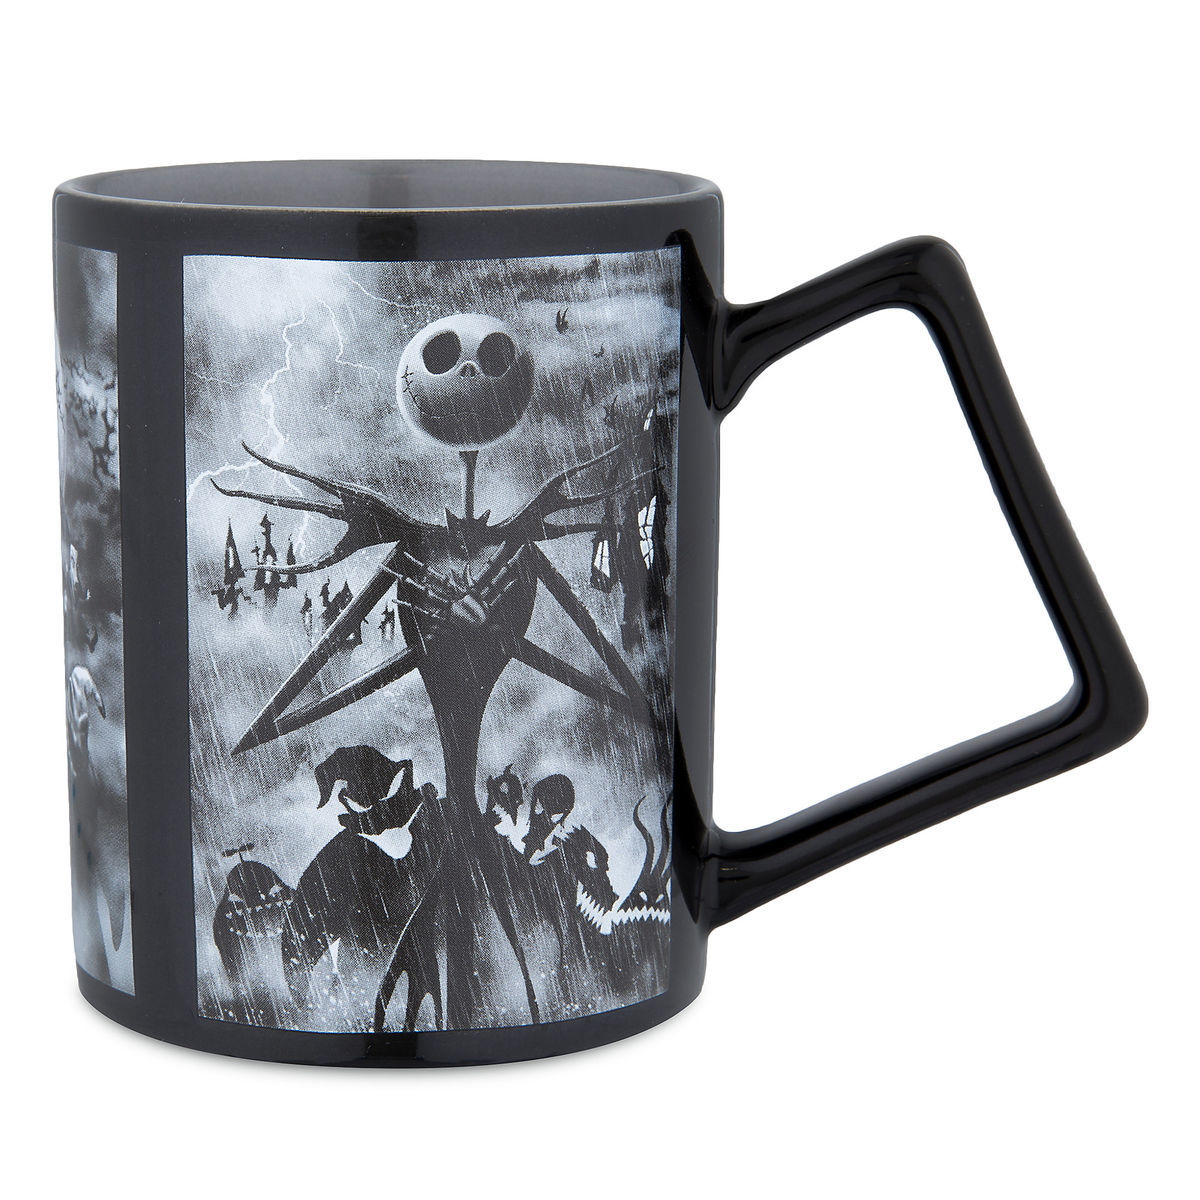 Nightmare Before Christmas Coffee Mug.Disney Coffee Mug Nightmare Before Christmas Characters